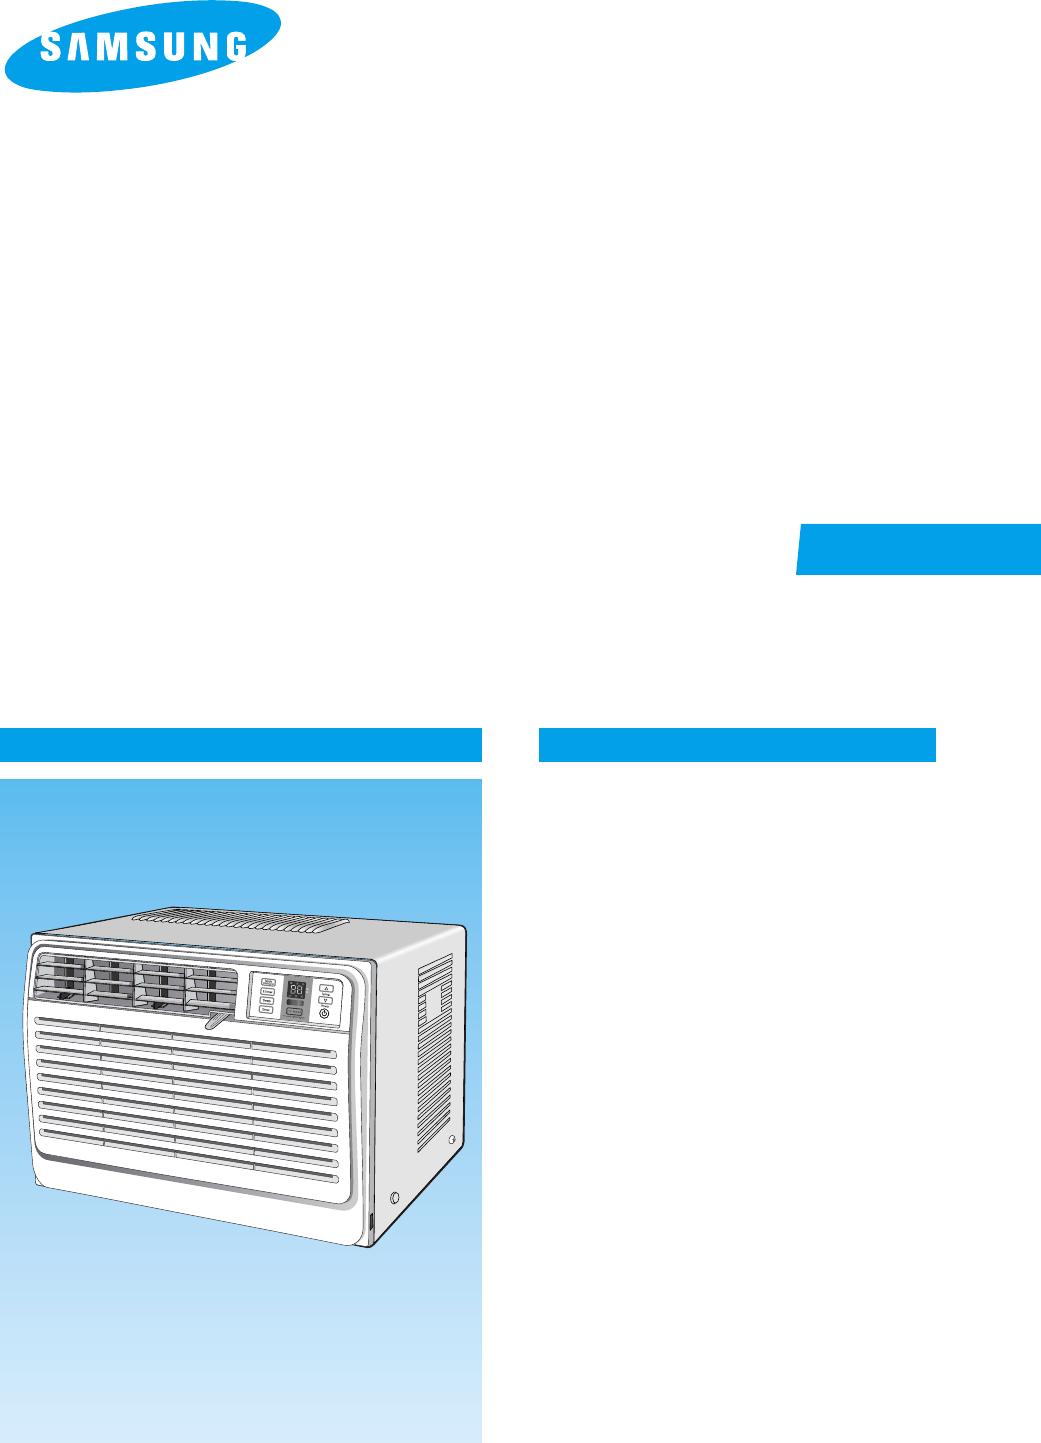 Installation manual Samsung Air conditioner Lg hauzen